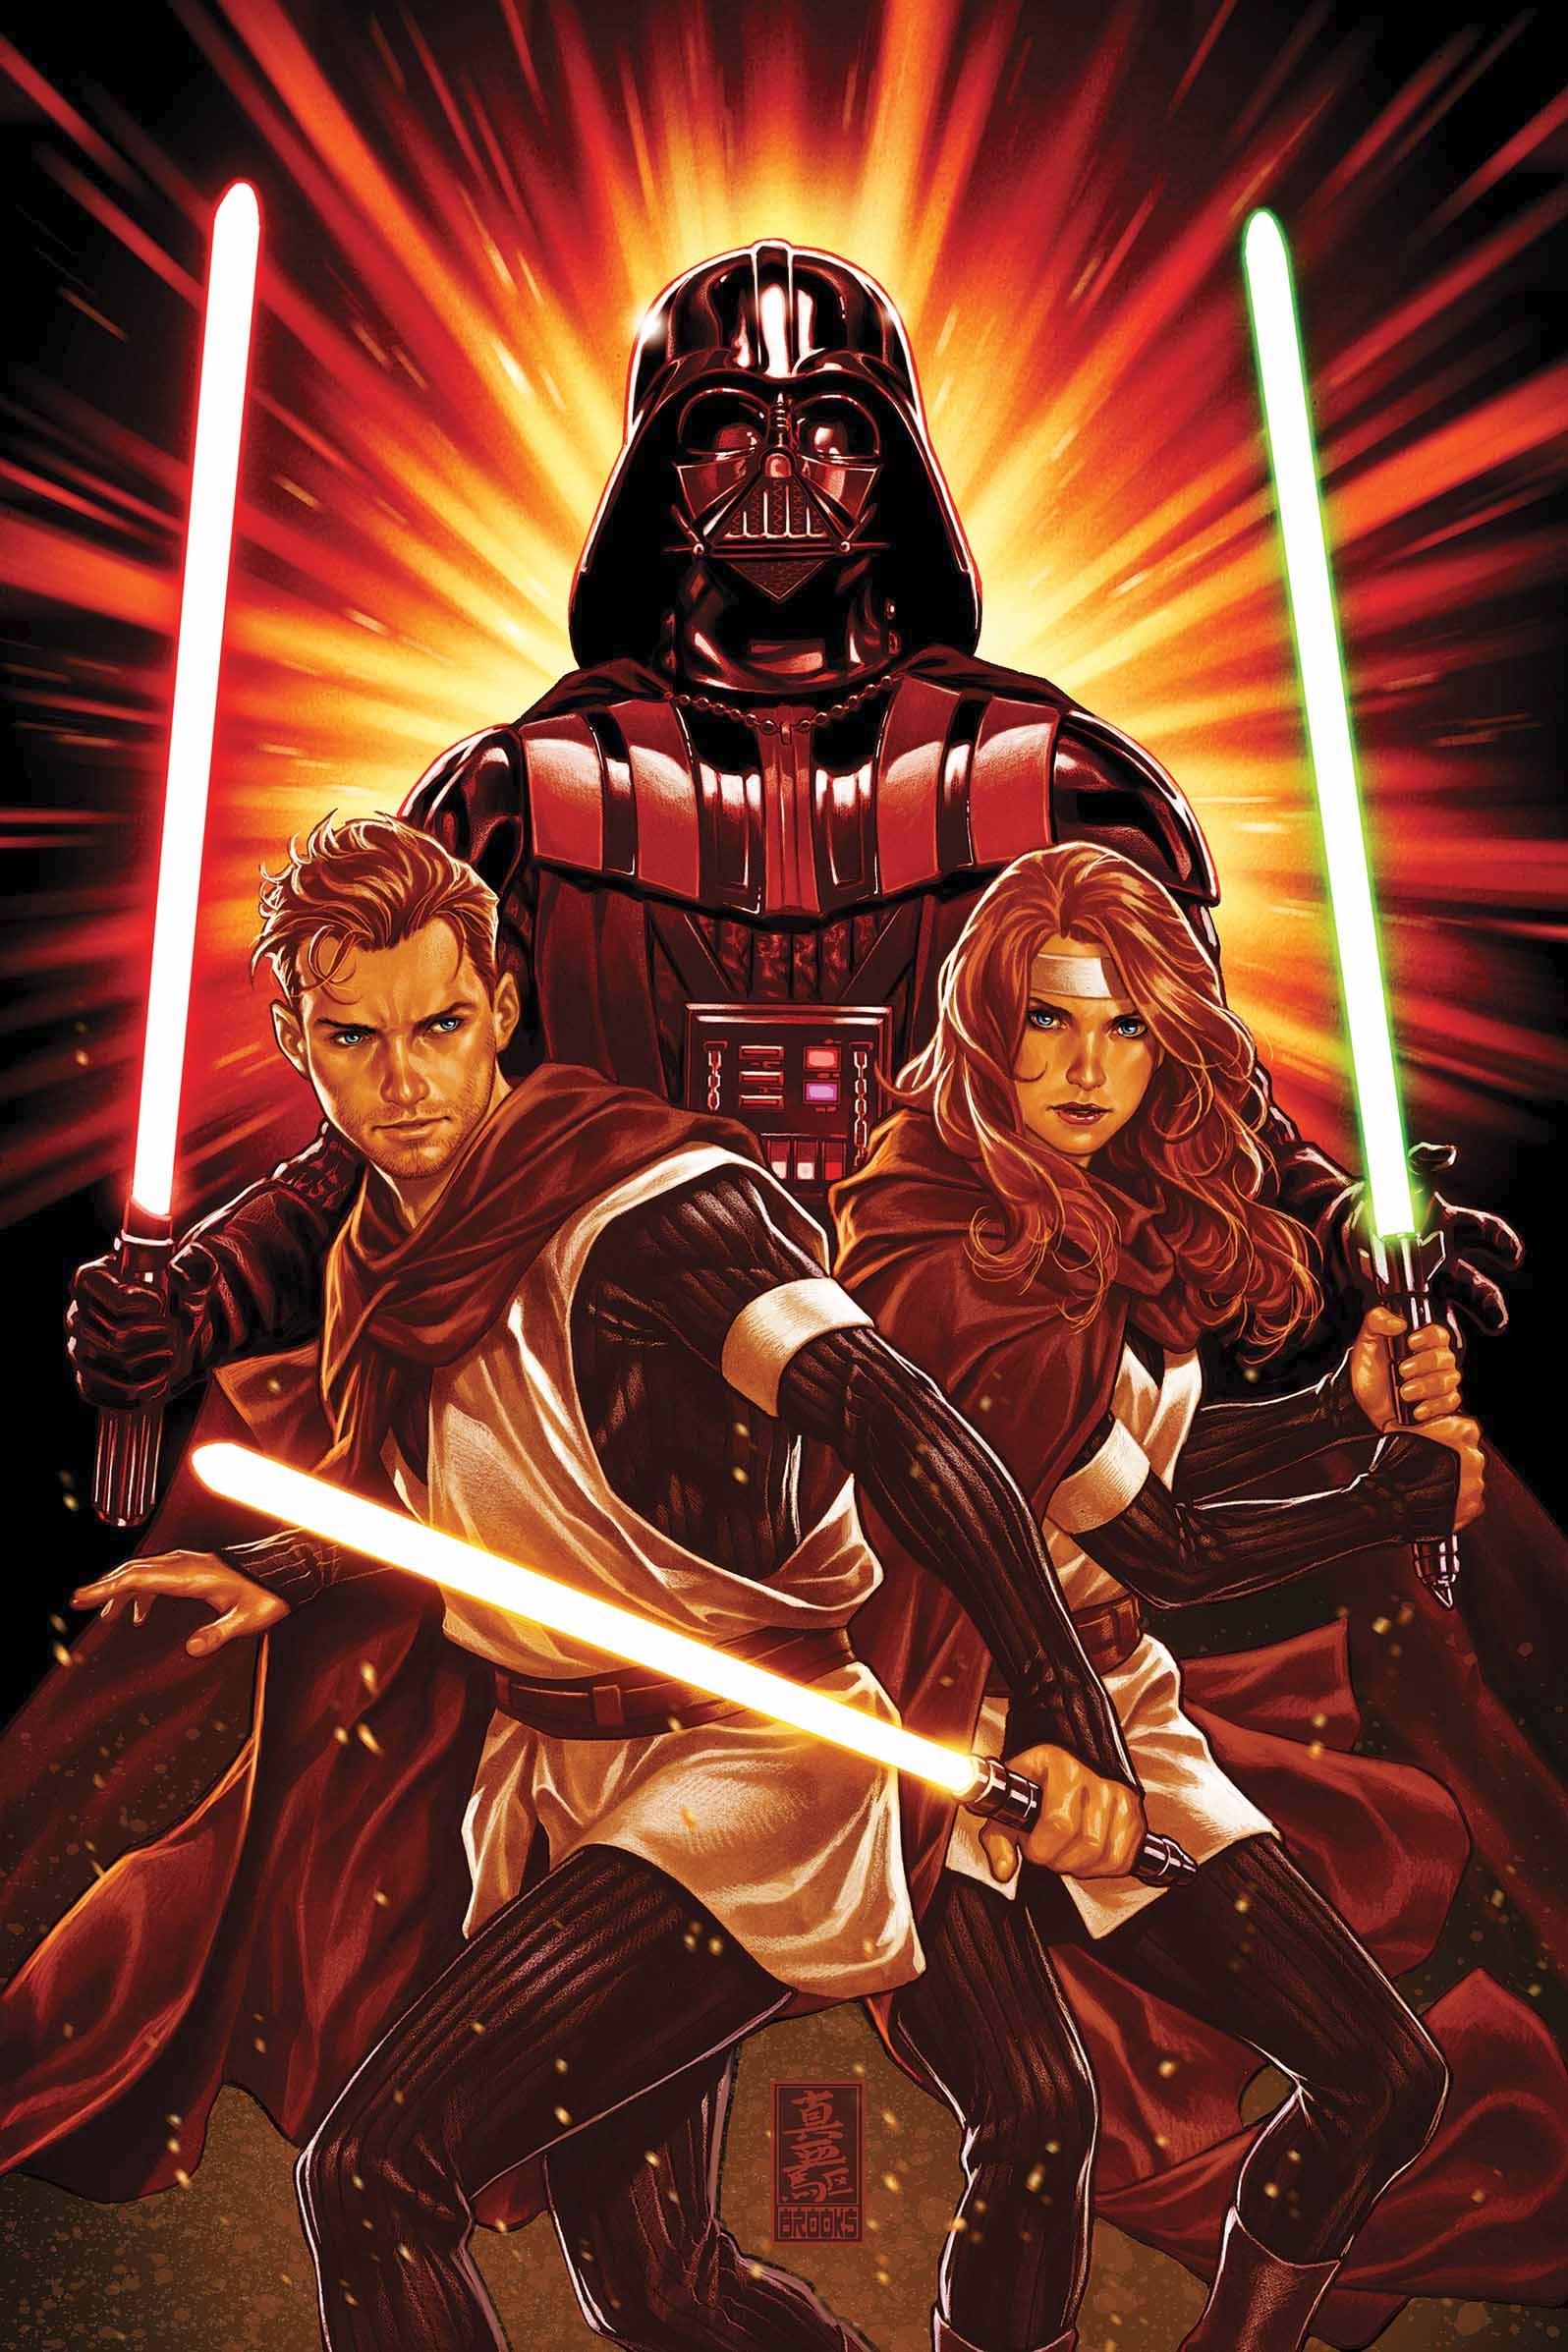 Star Wars Comics 10 - Couverture B